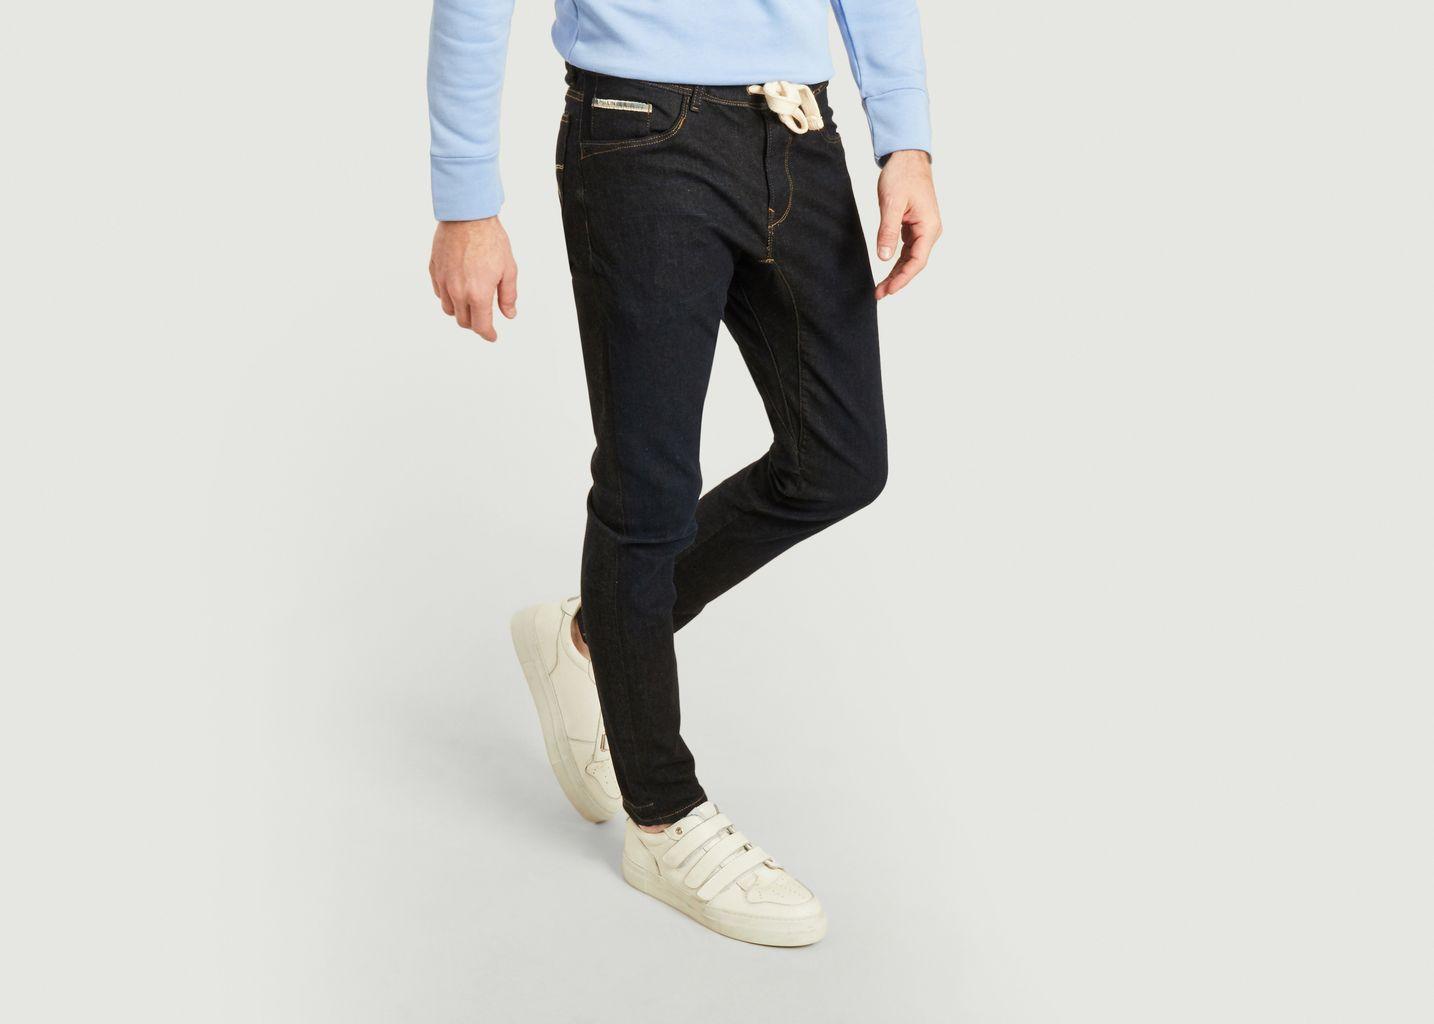 Pantalon Dening Epic 2 - PULLIN